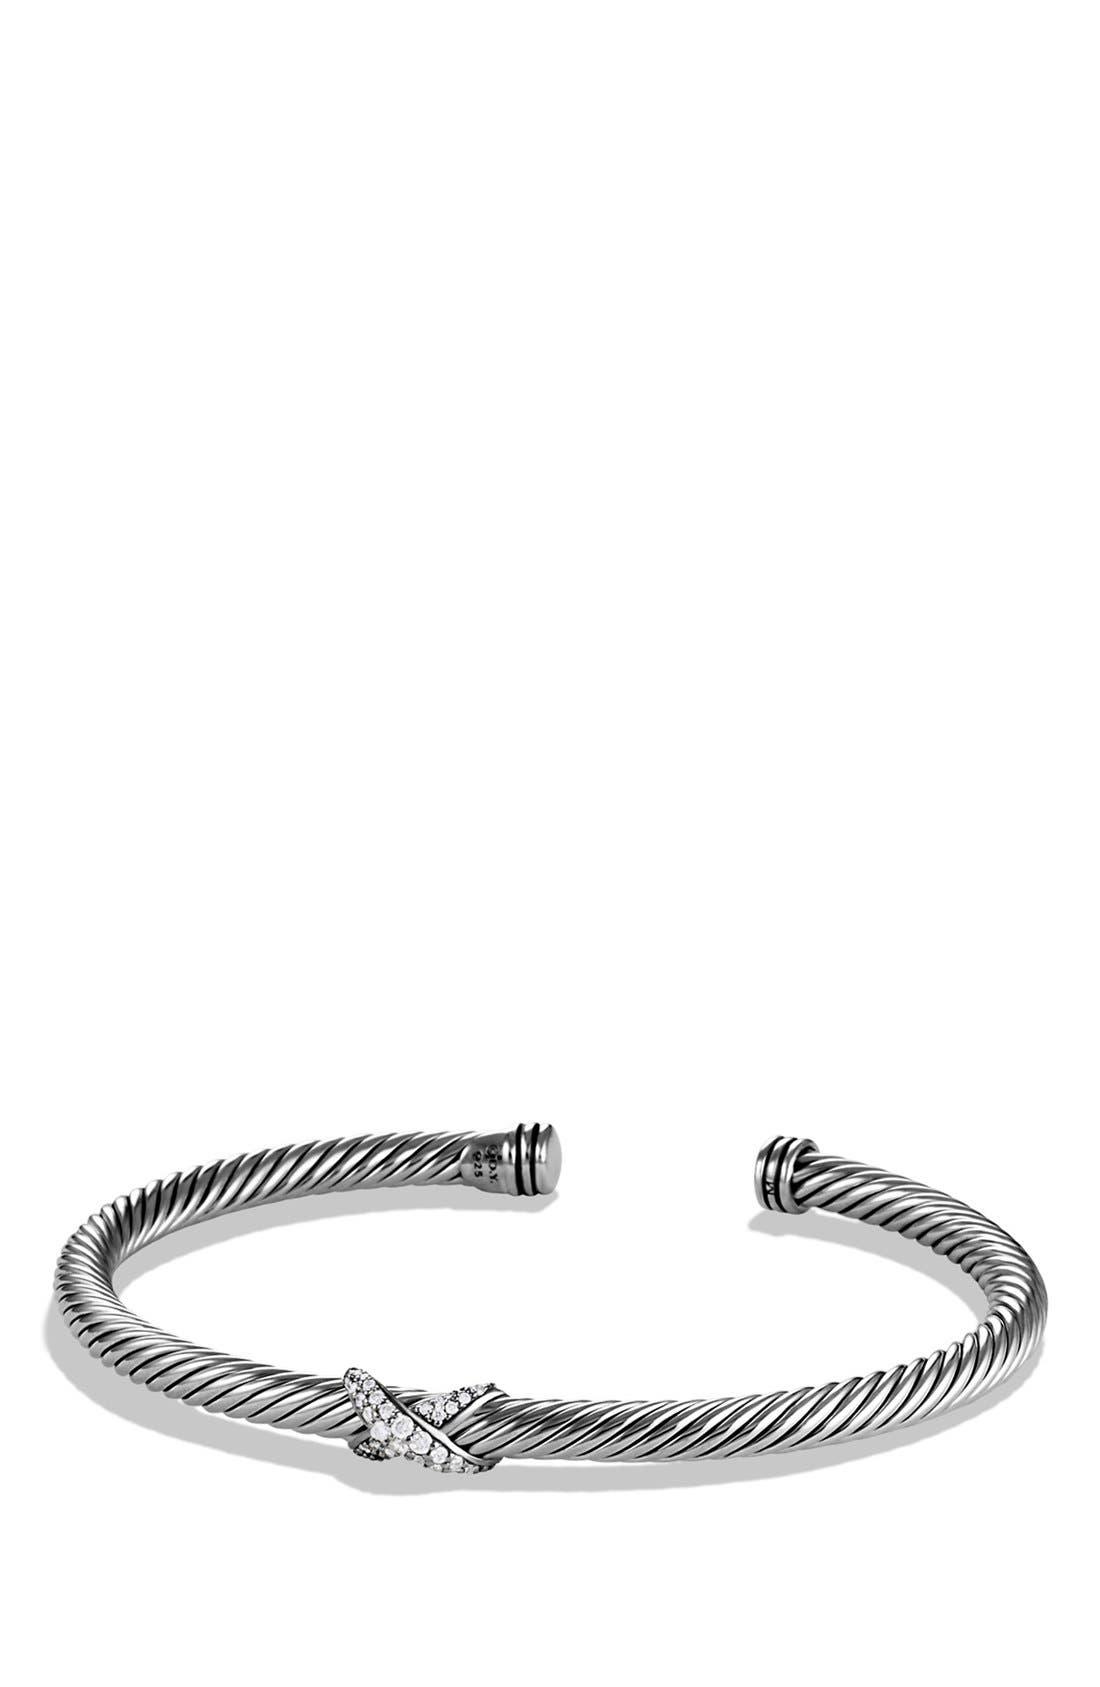 'X' Bracelet with Diamonds,                             Main thumbnail 1, color,                             Diamond